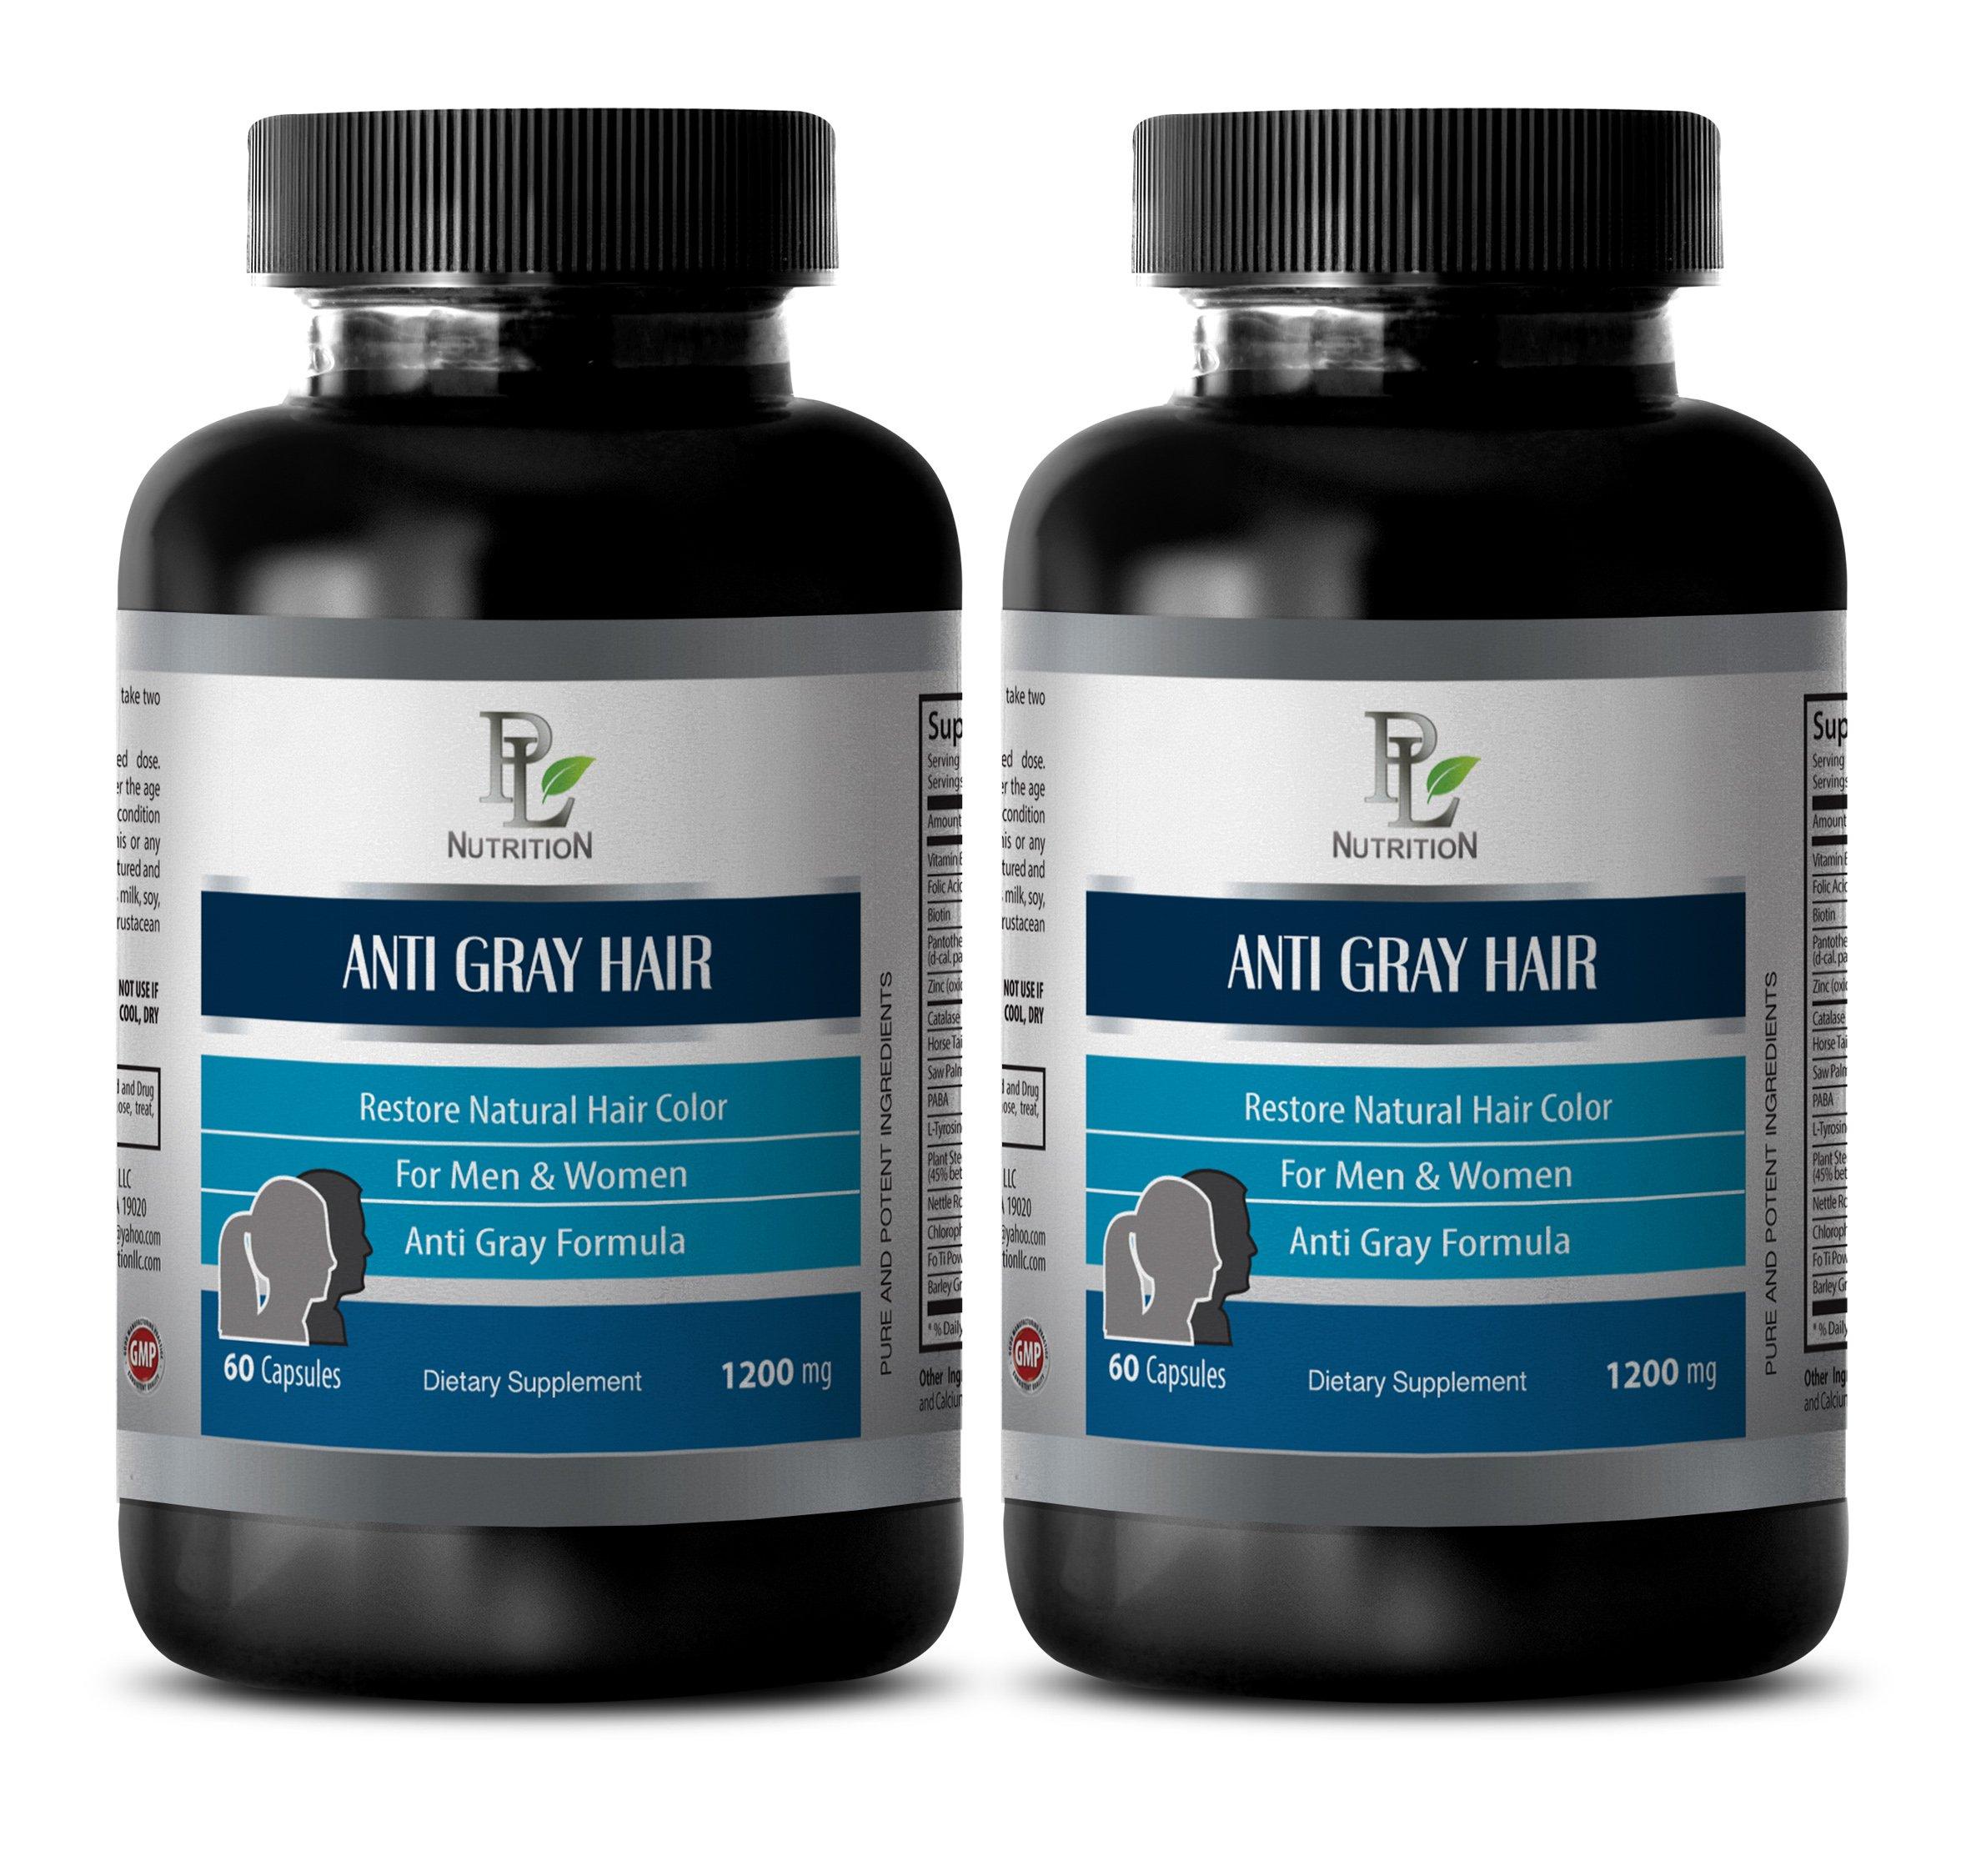 Gray hair vitamins - ANTI GRAY HAIR NATURAL COMPLEX 1200mg - Biotin for hair loss for men - 2 Bottles 120 Capsules